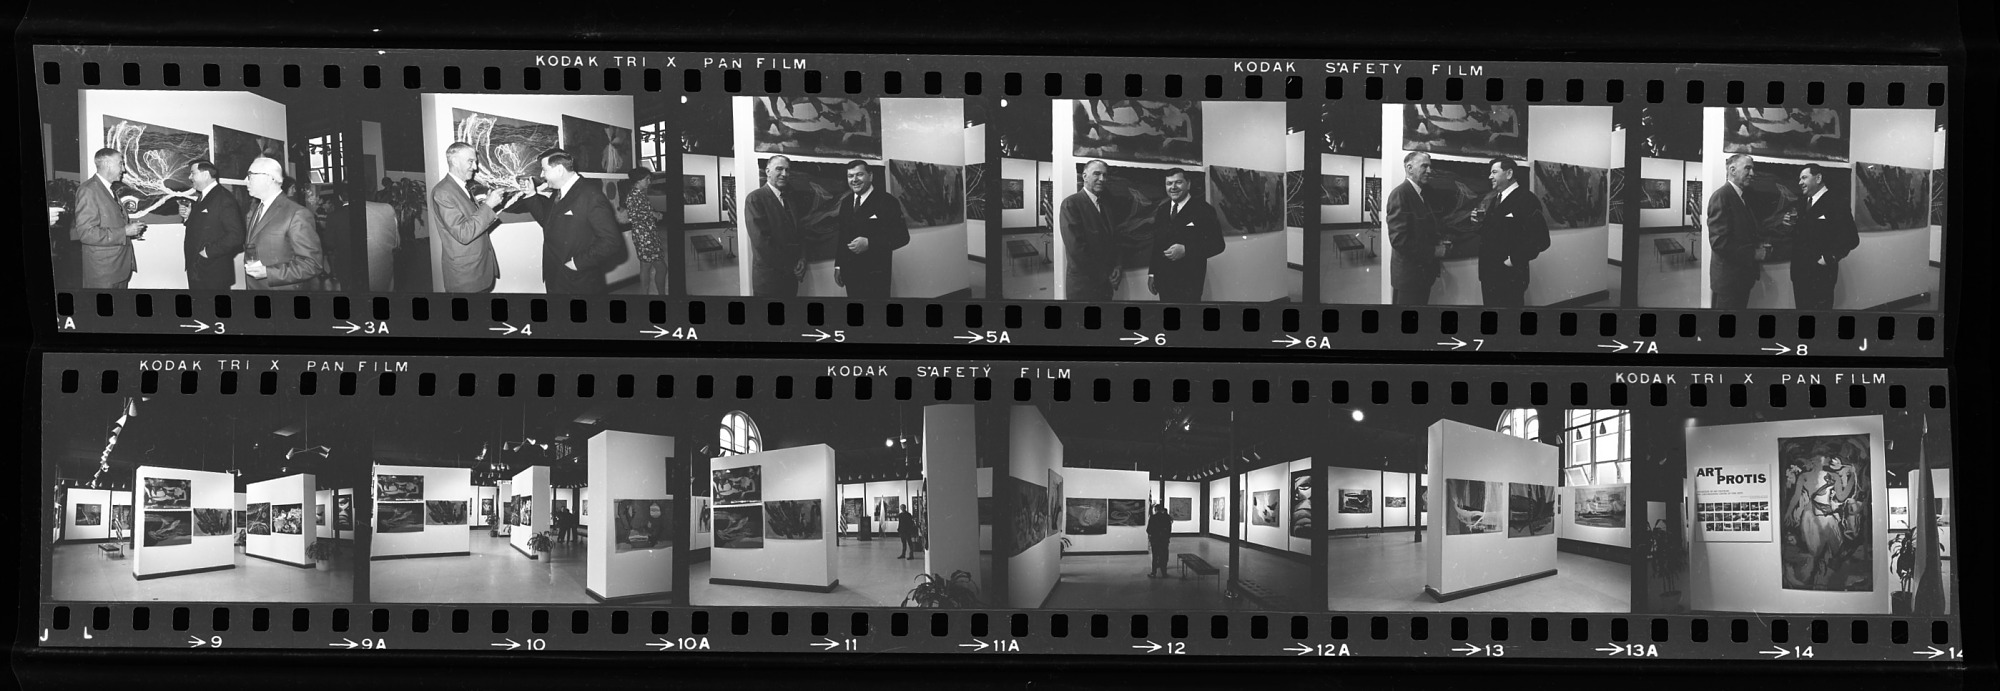 """Art Protis"" Exhibition"